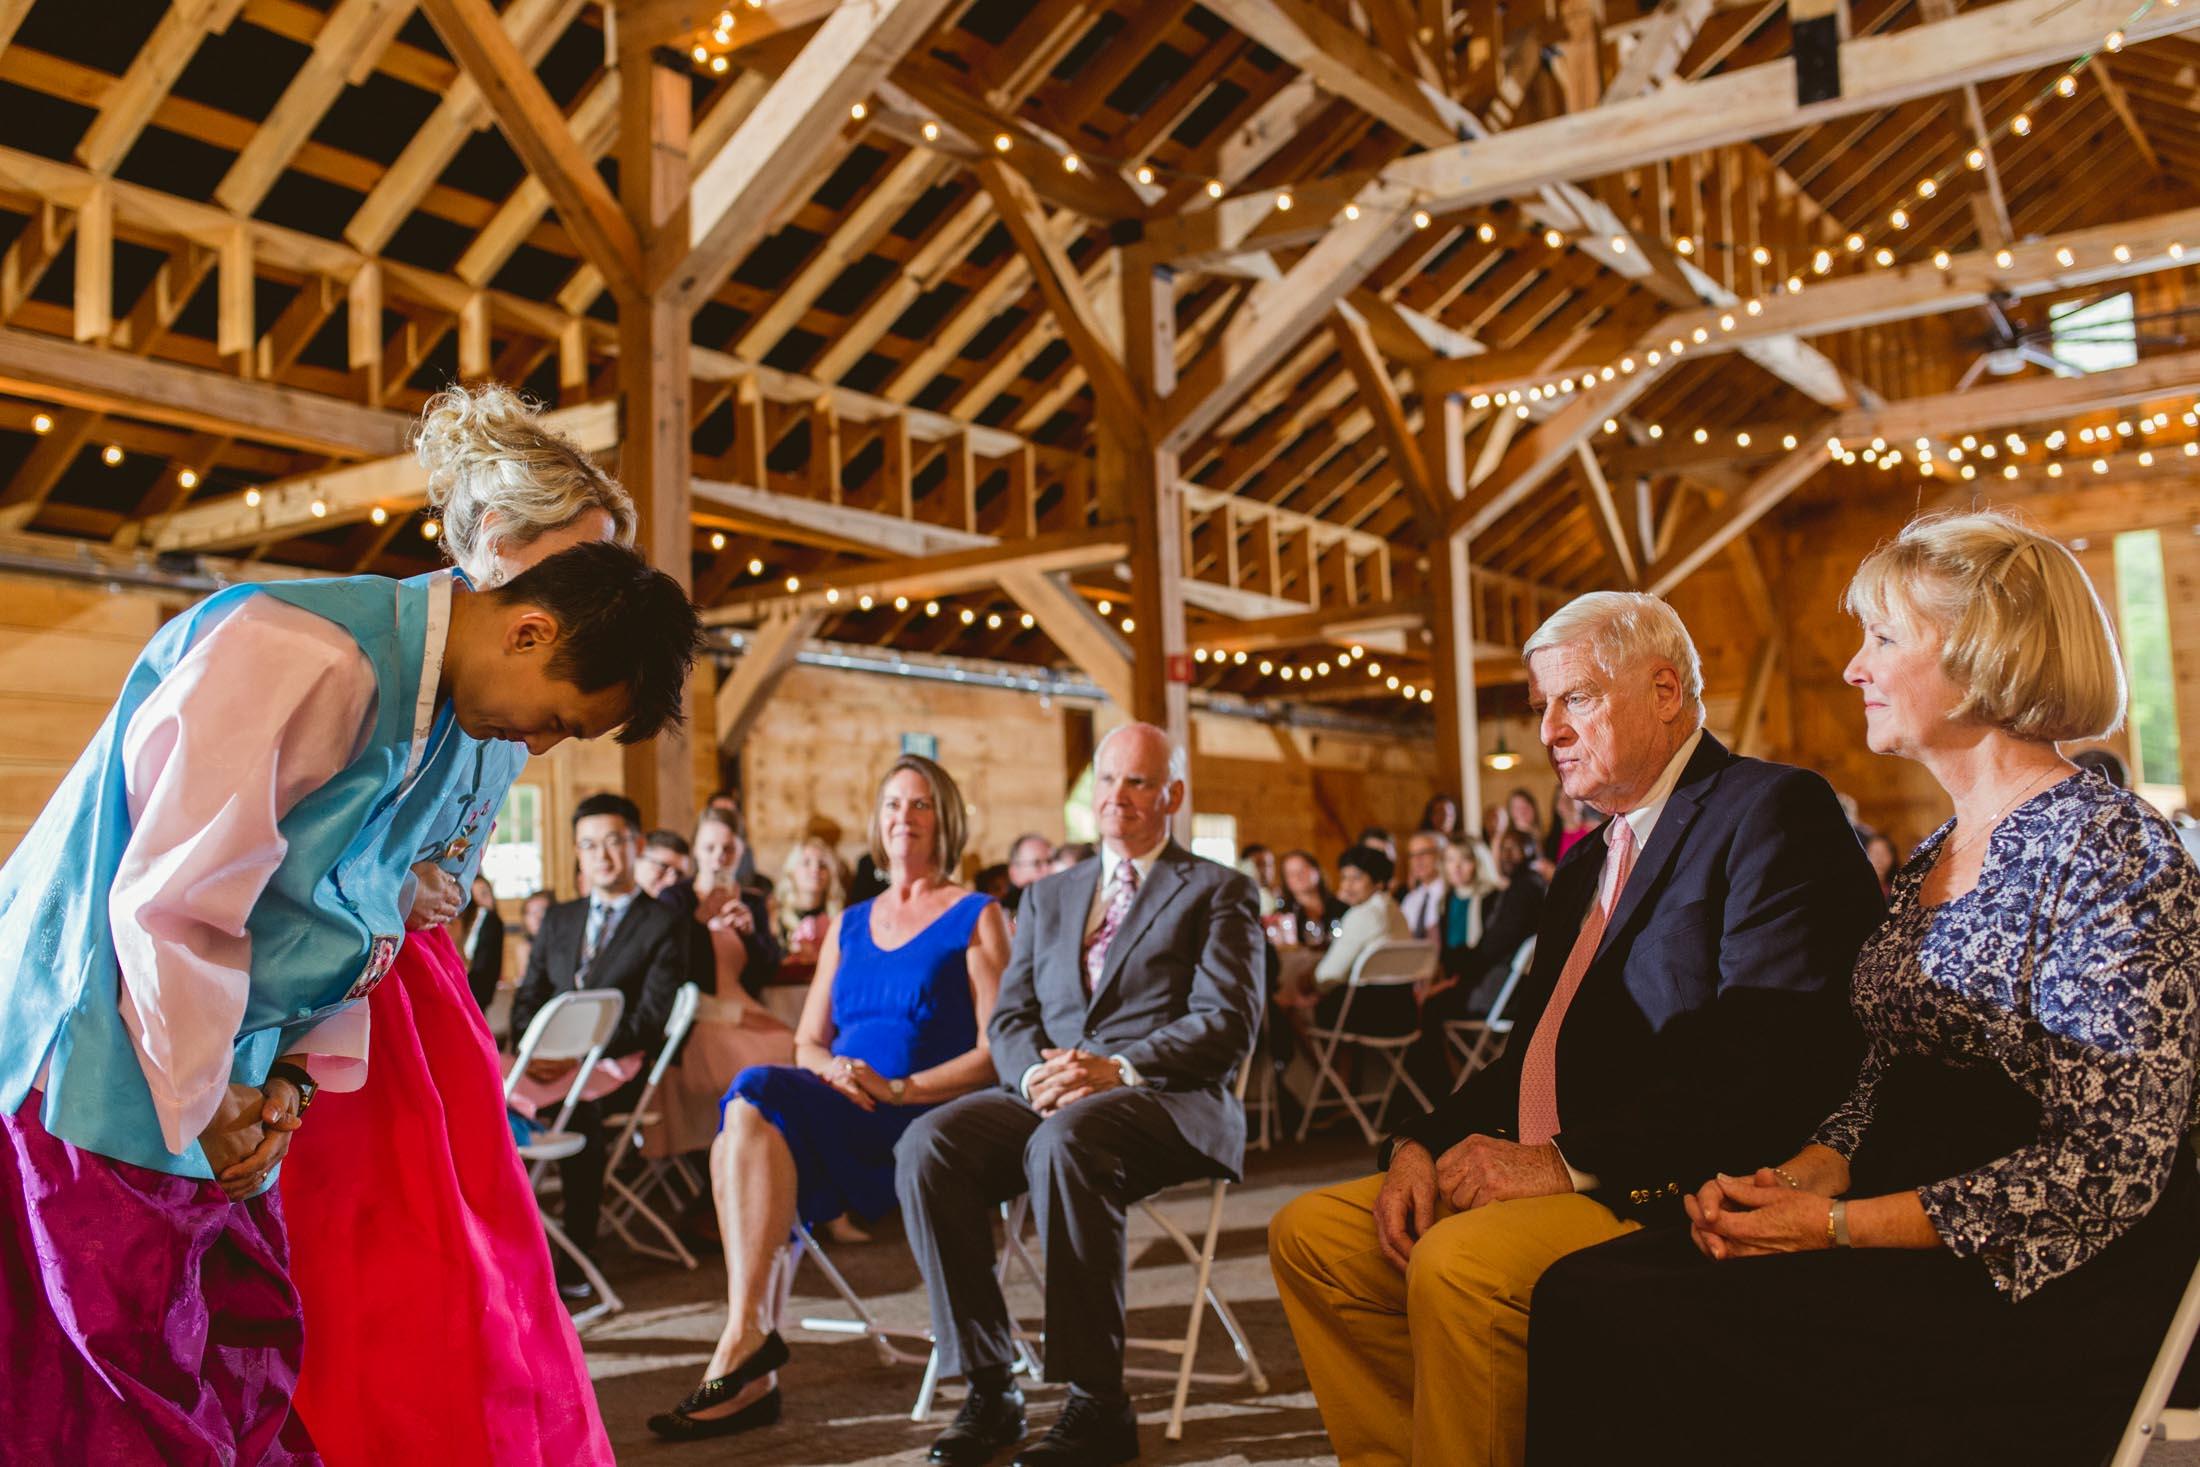 Blissful-Meadows-wedding-25.jpg